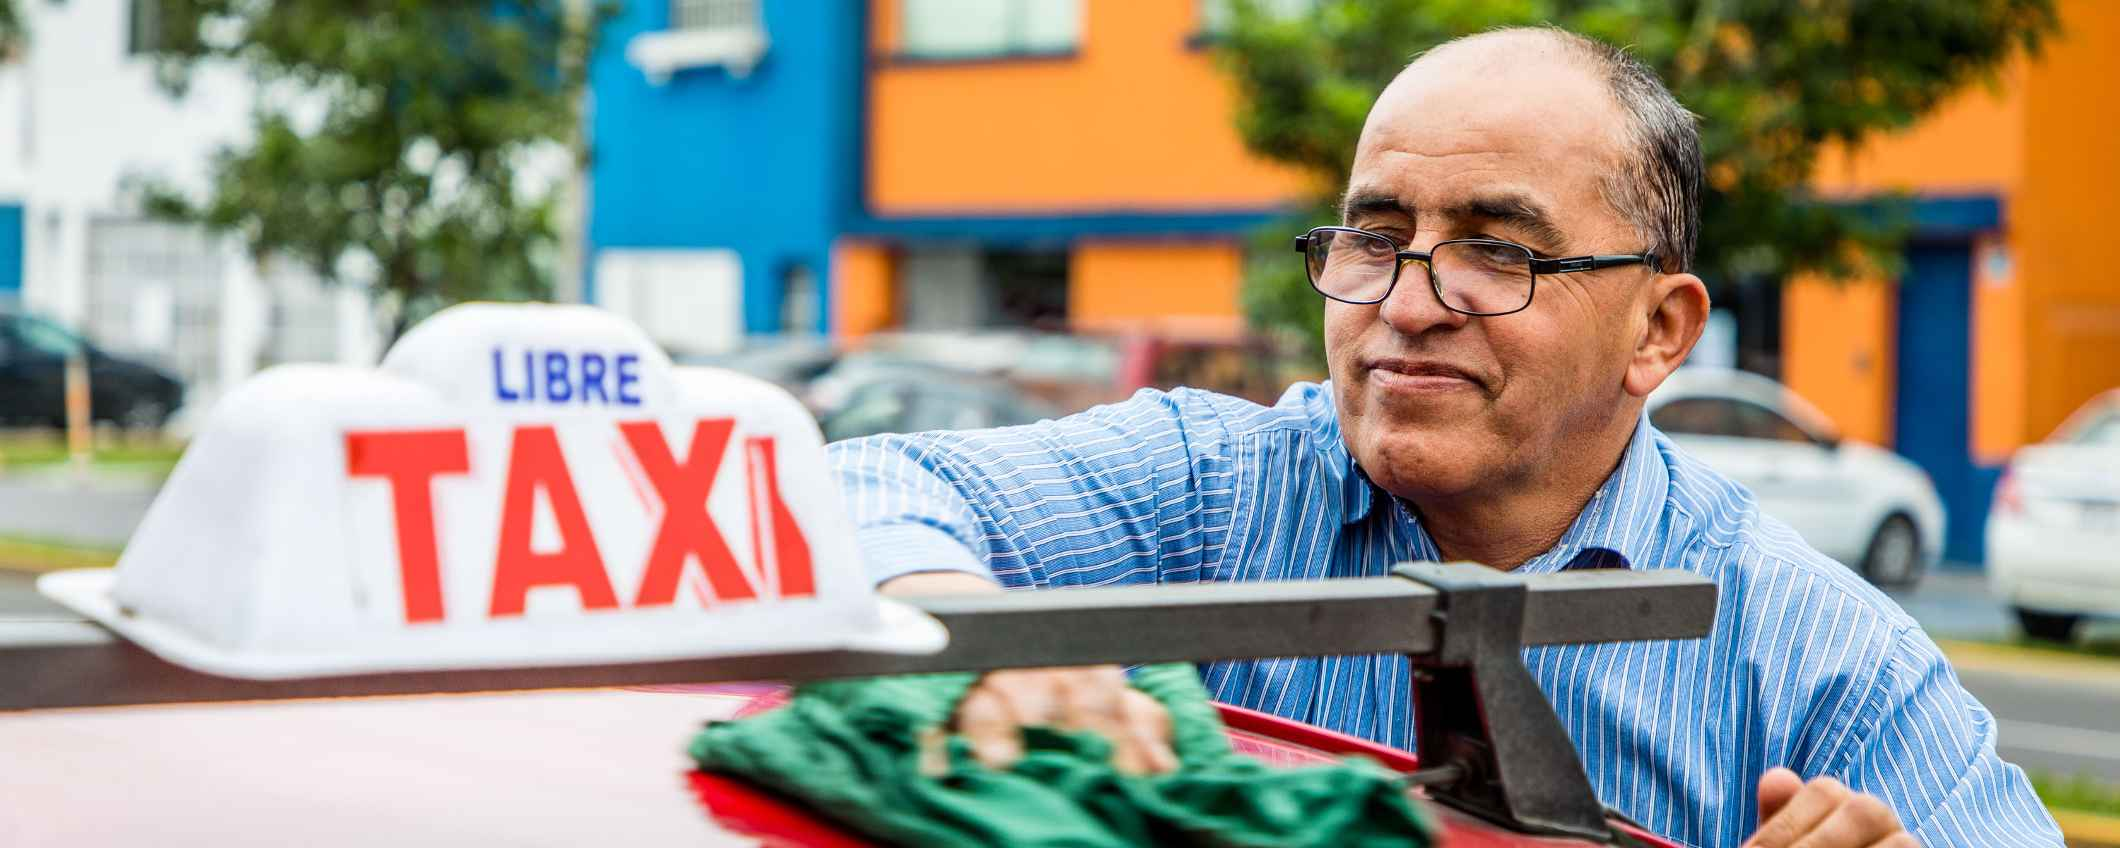 peru taxi lending microfinance